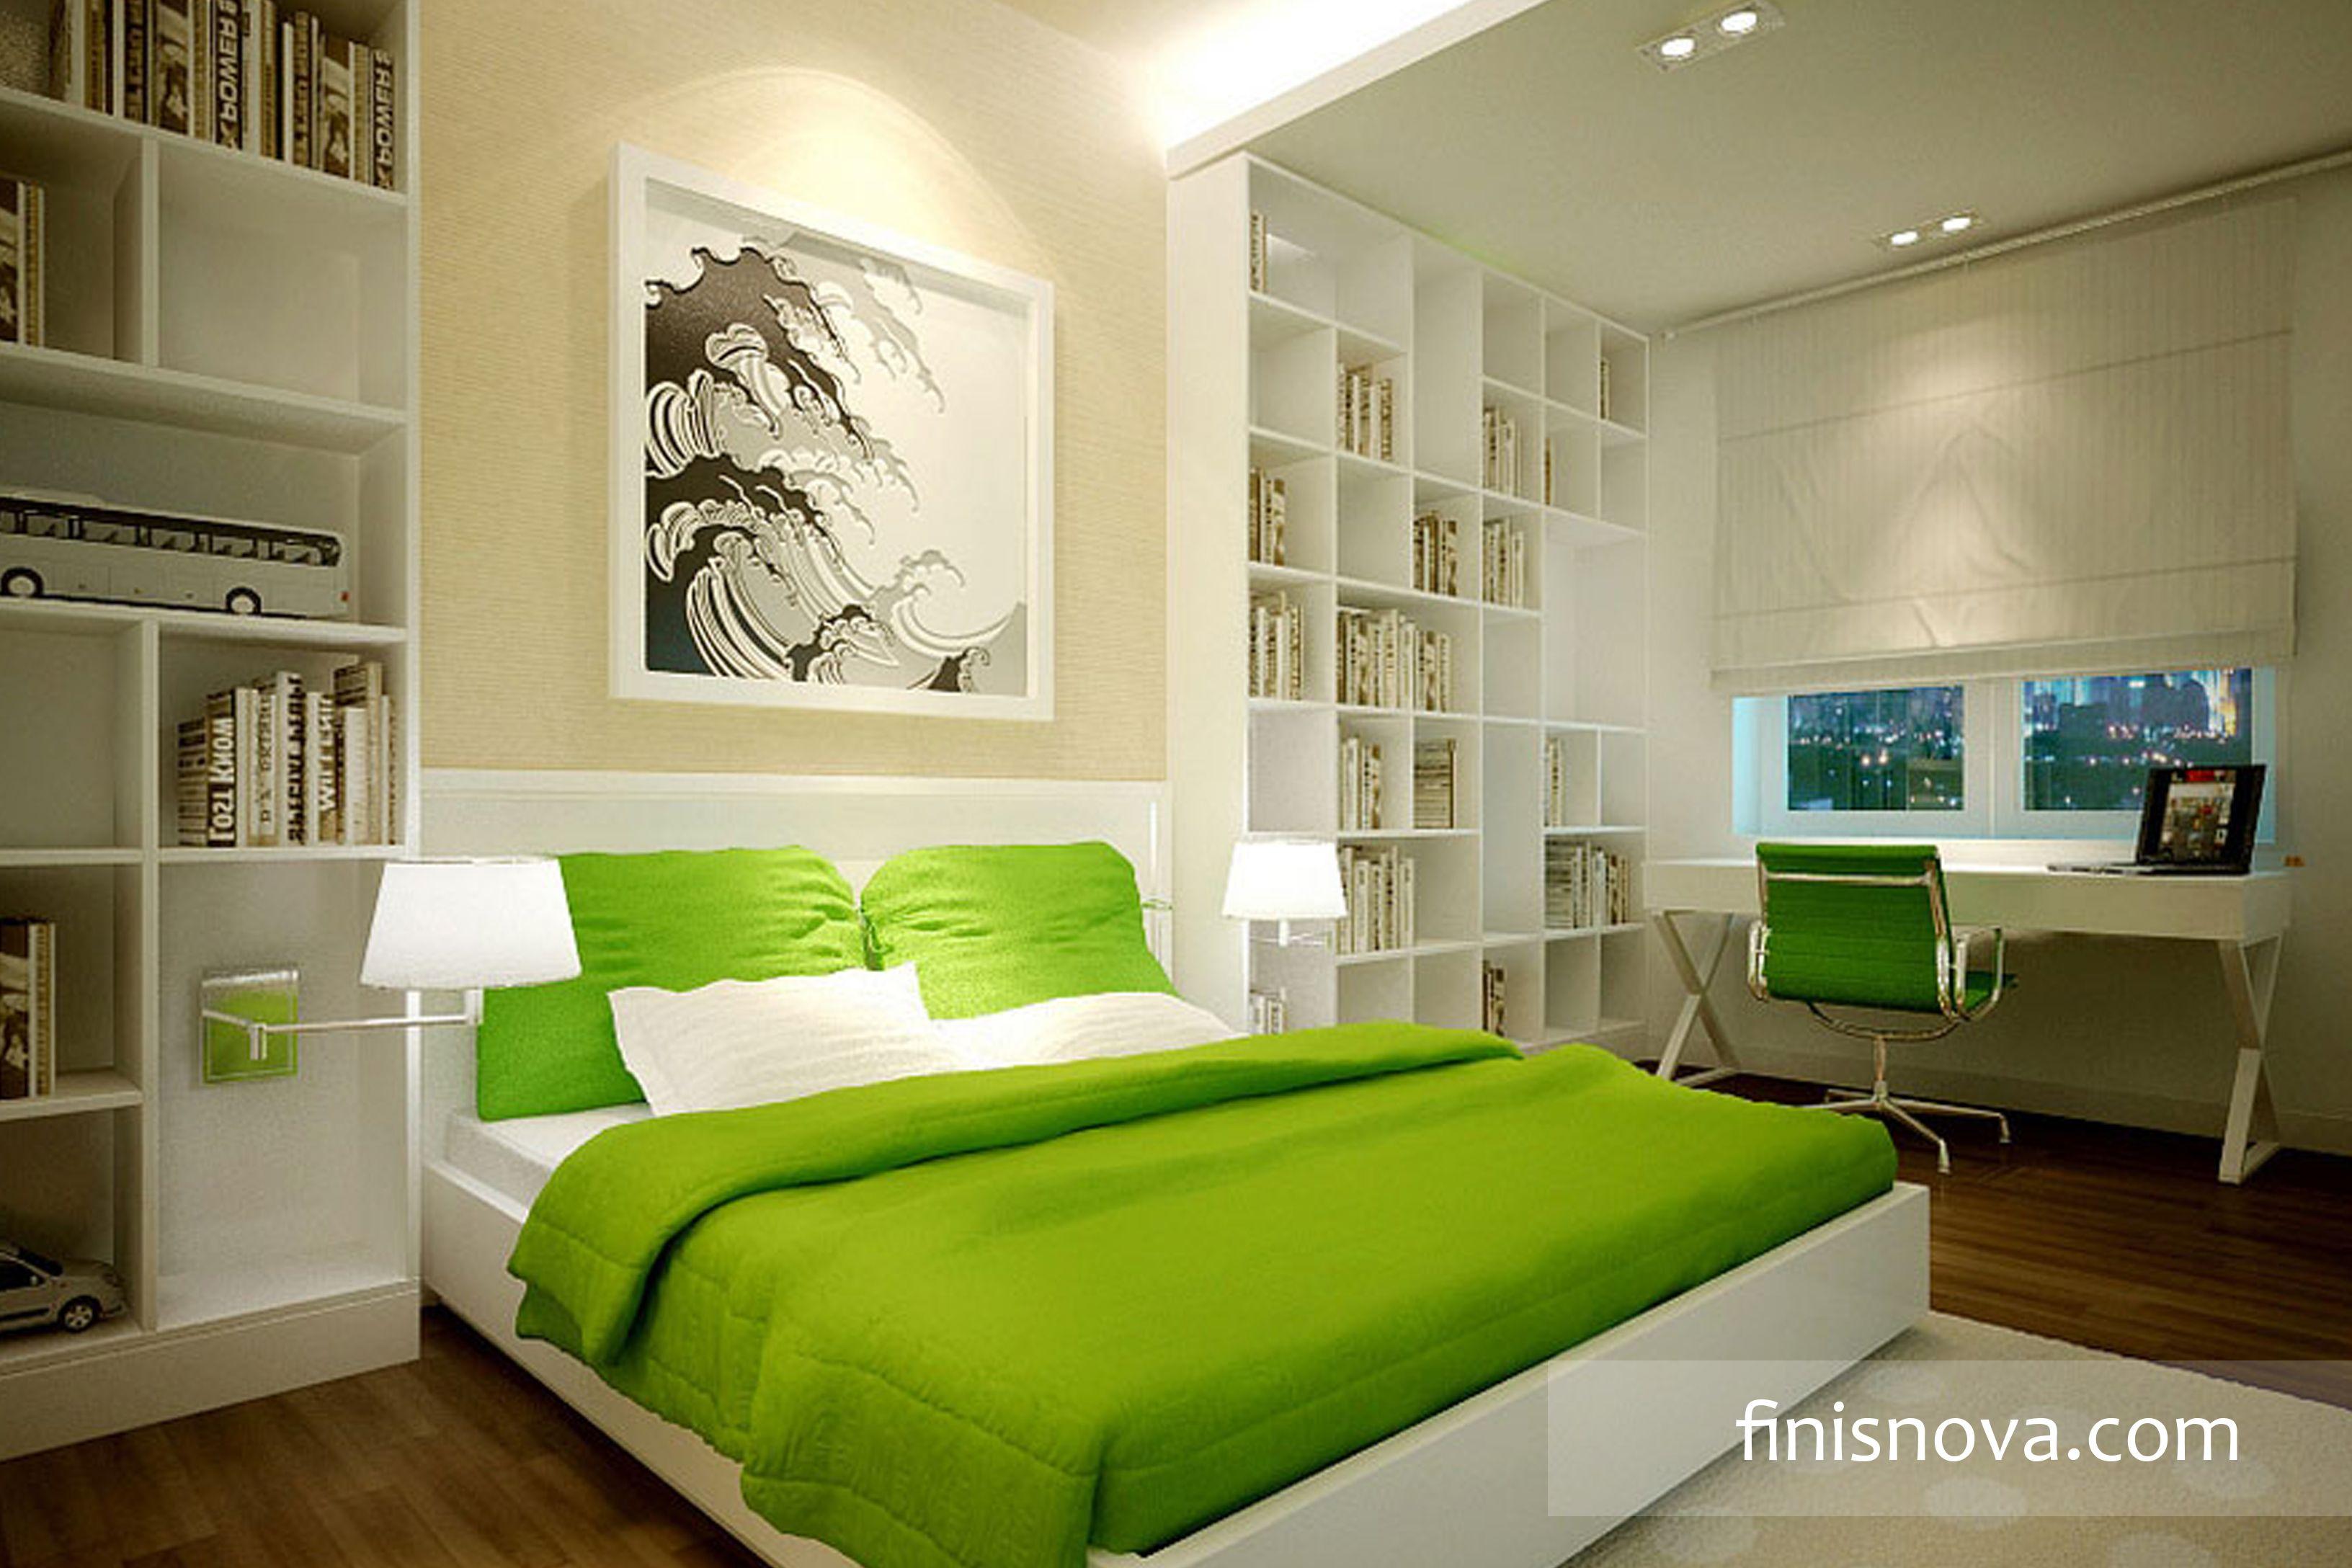 Decoraci n dormitorio matrimonial estilo limpio puro y for Decoracion dormitorio matrimonial segun feng shui